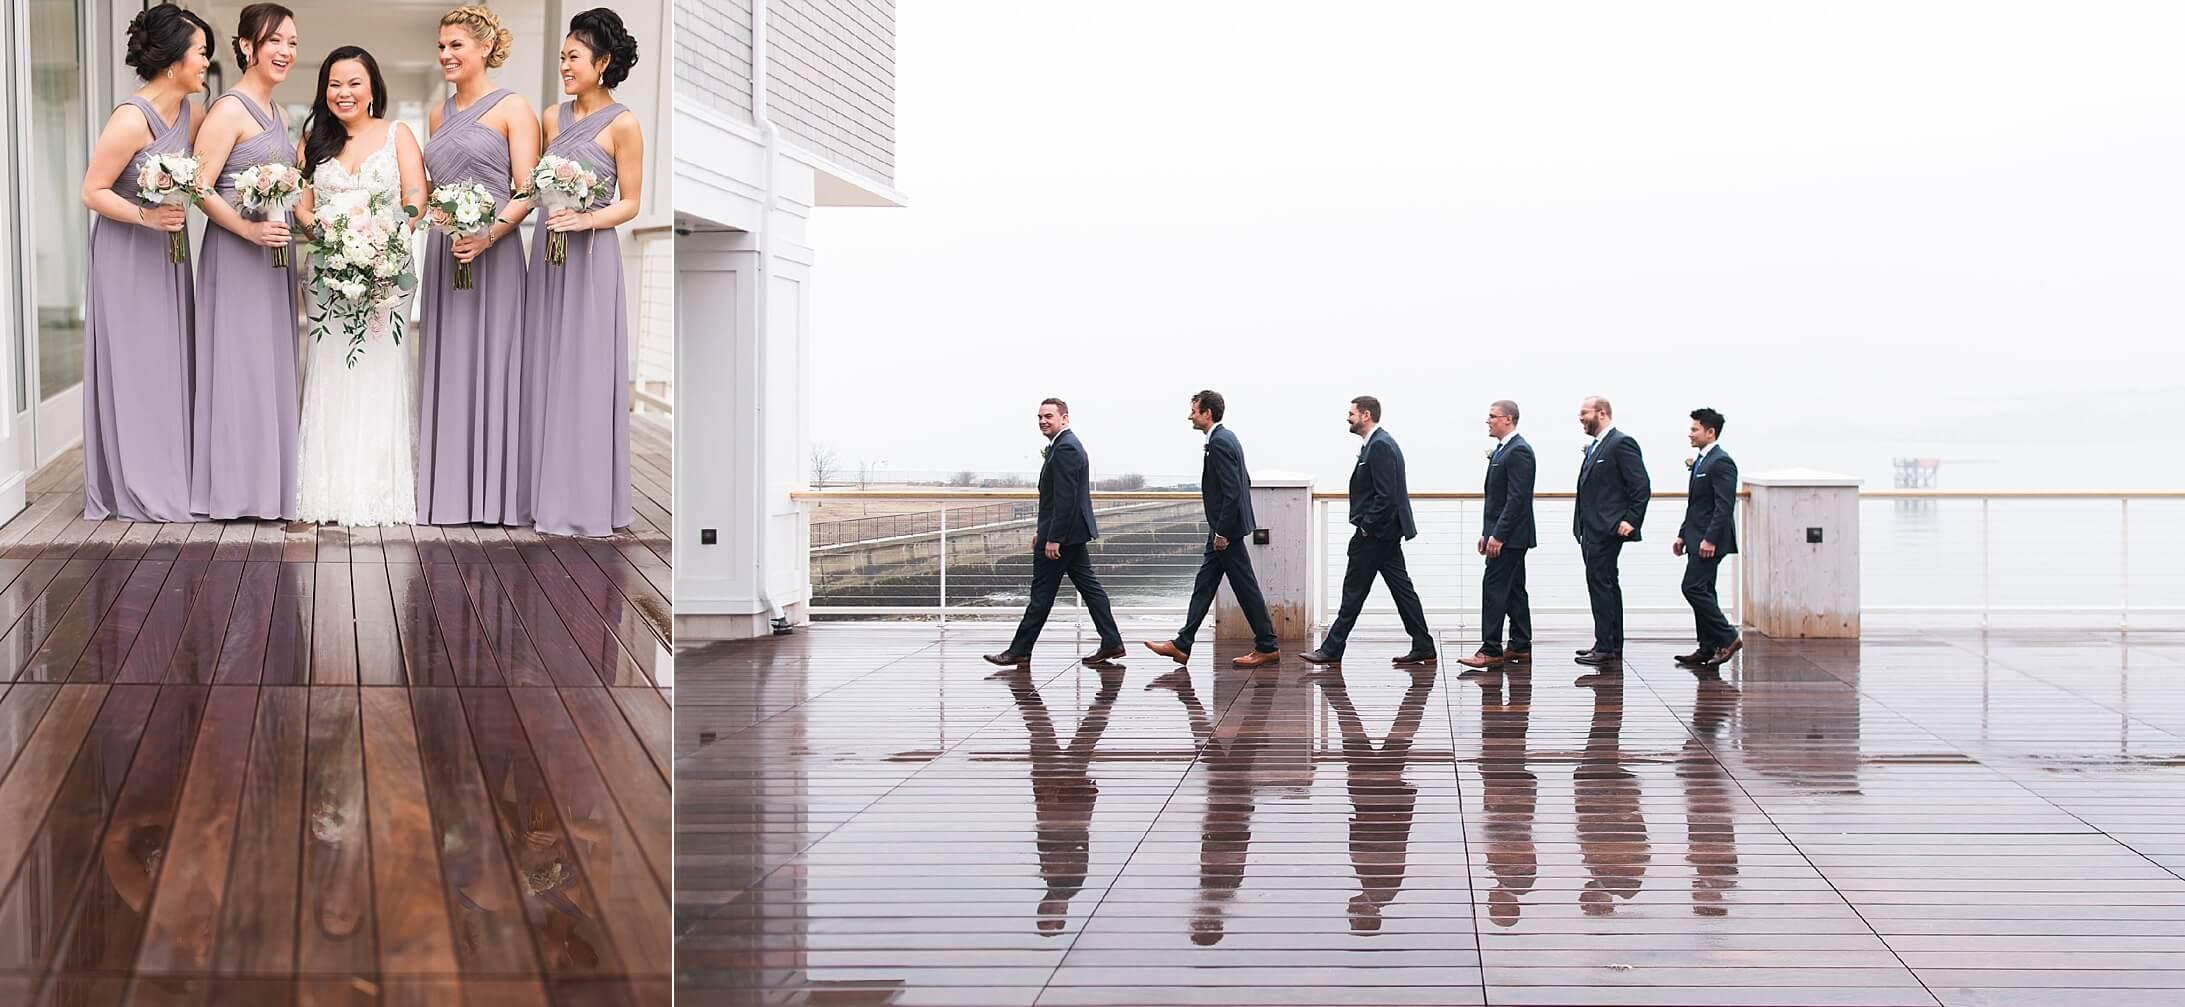 Beauport Hotel Wedding - Ebersole Photo_0001.jpg